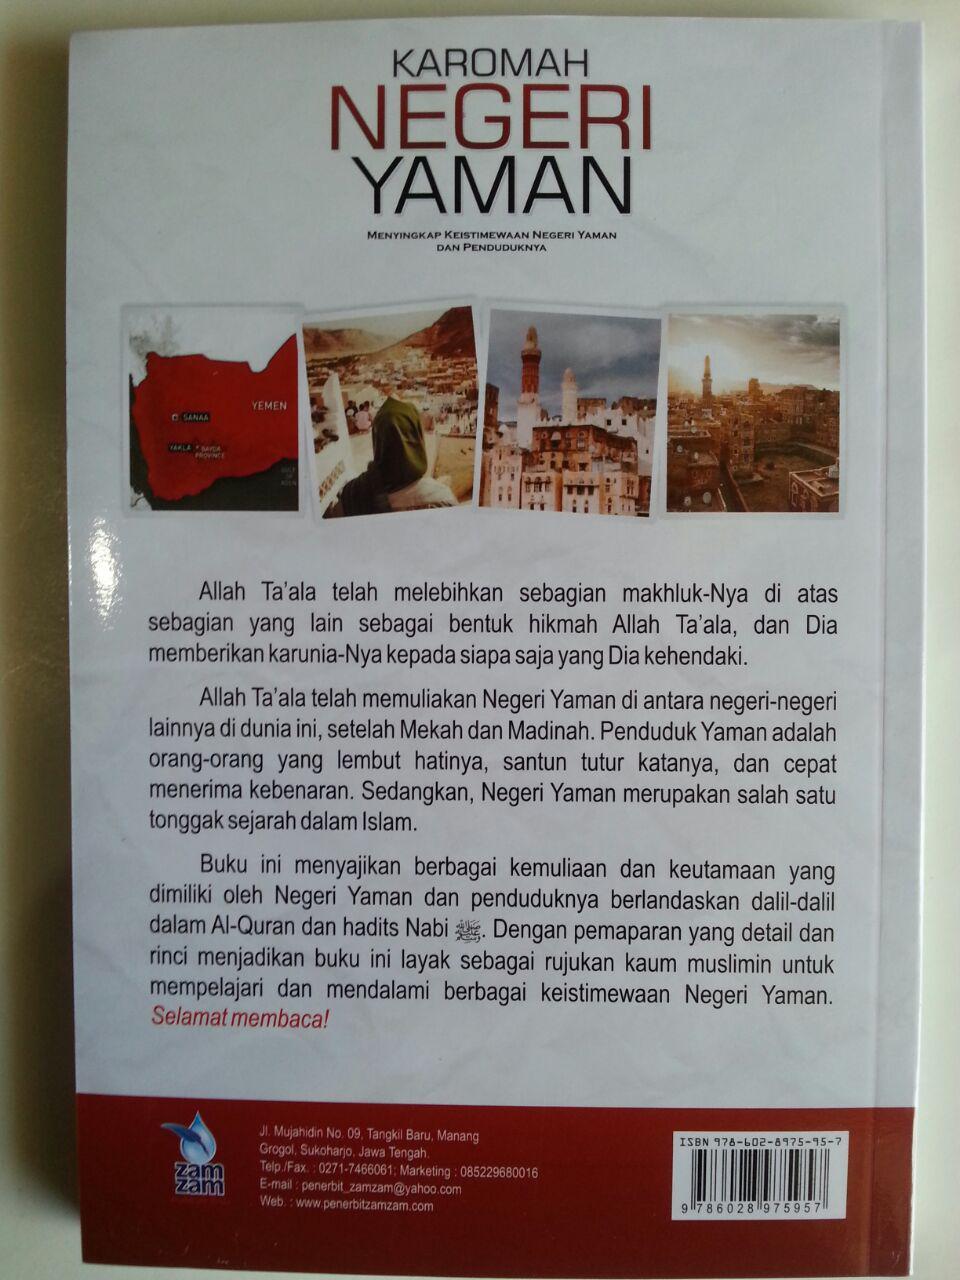 Buku Karomah Negeri Yaman Keistimewaan Yaman Dan Penduduknya cover